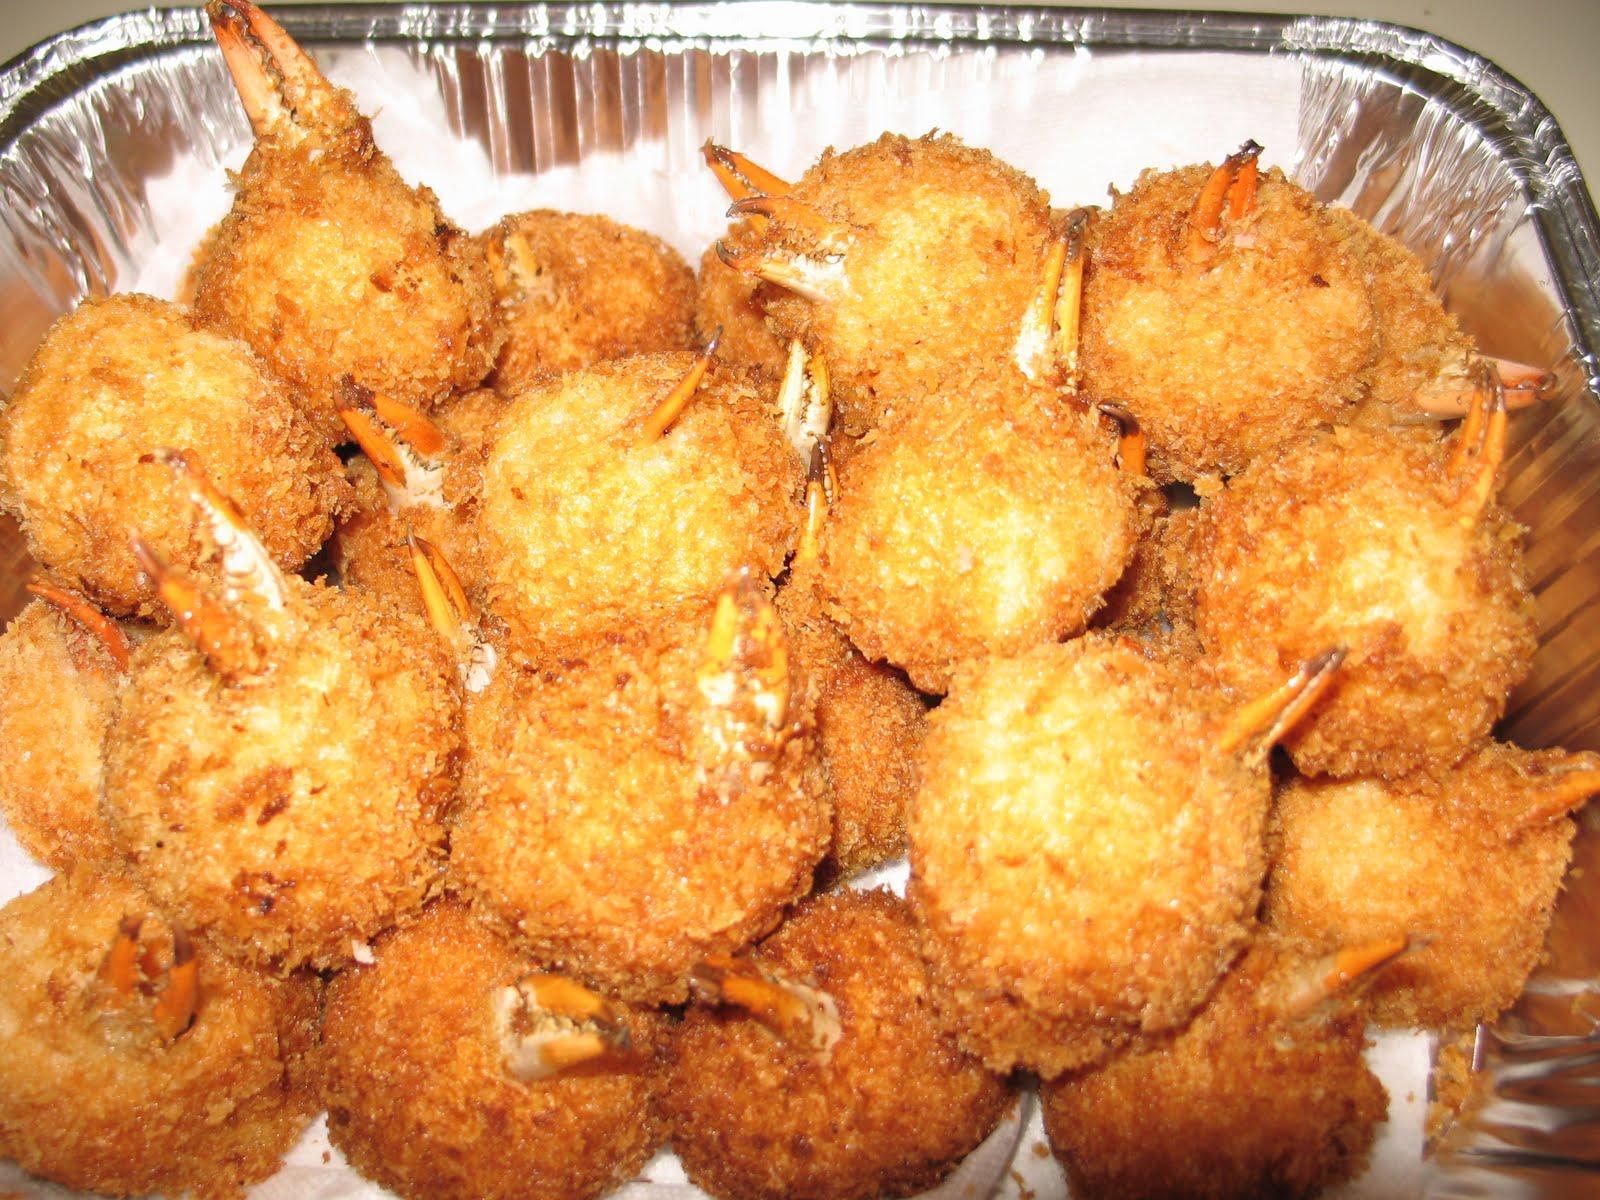 TrucVy-Zoe's Zone: Shrimp Stuffed Crab Claws